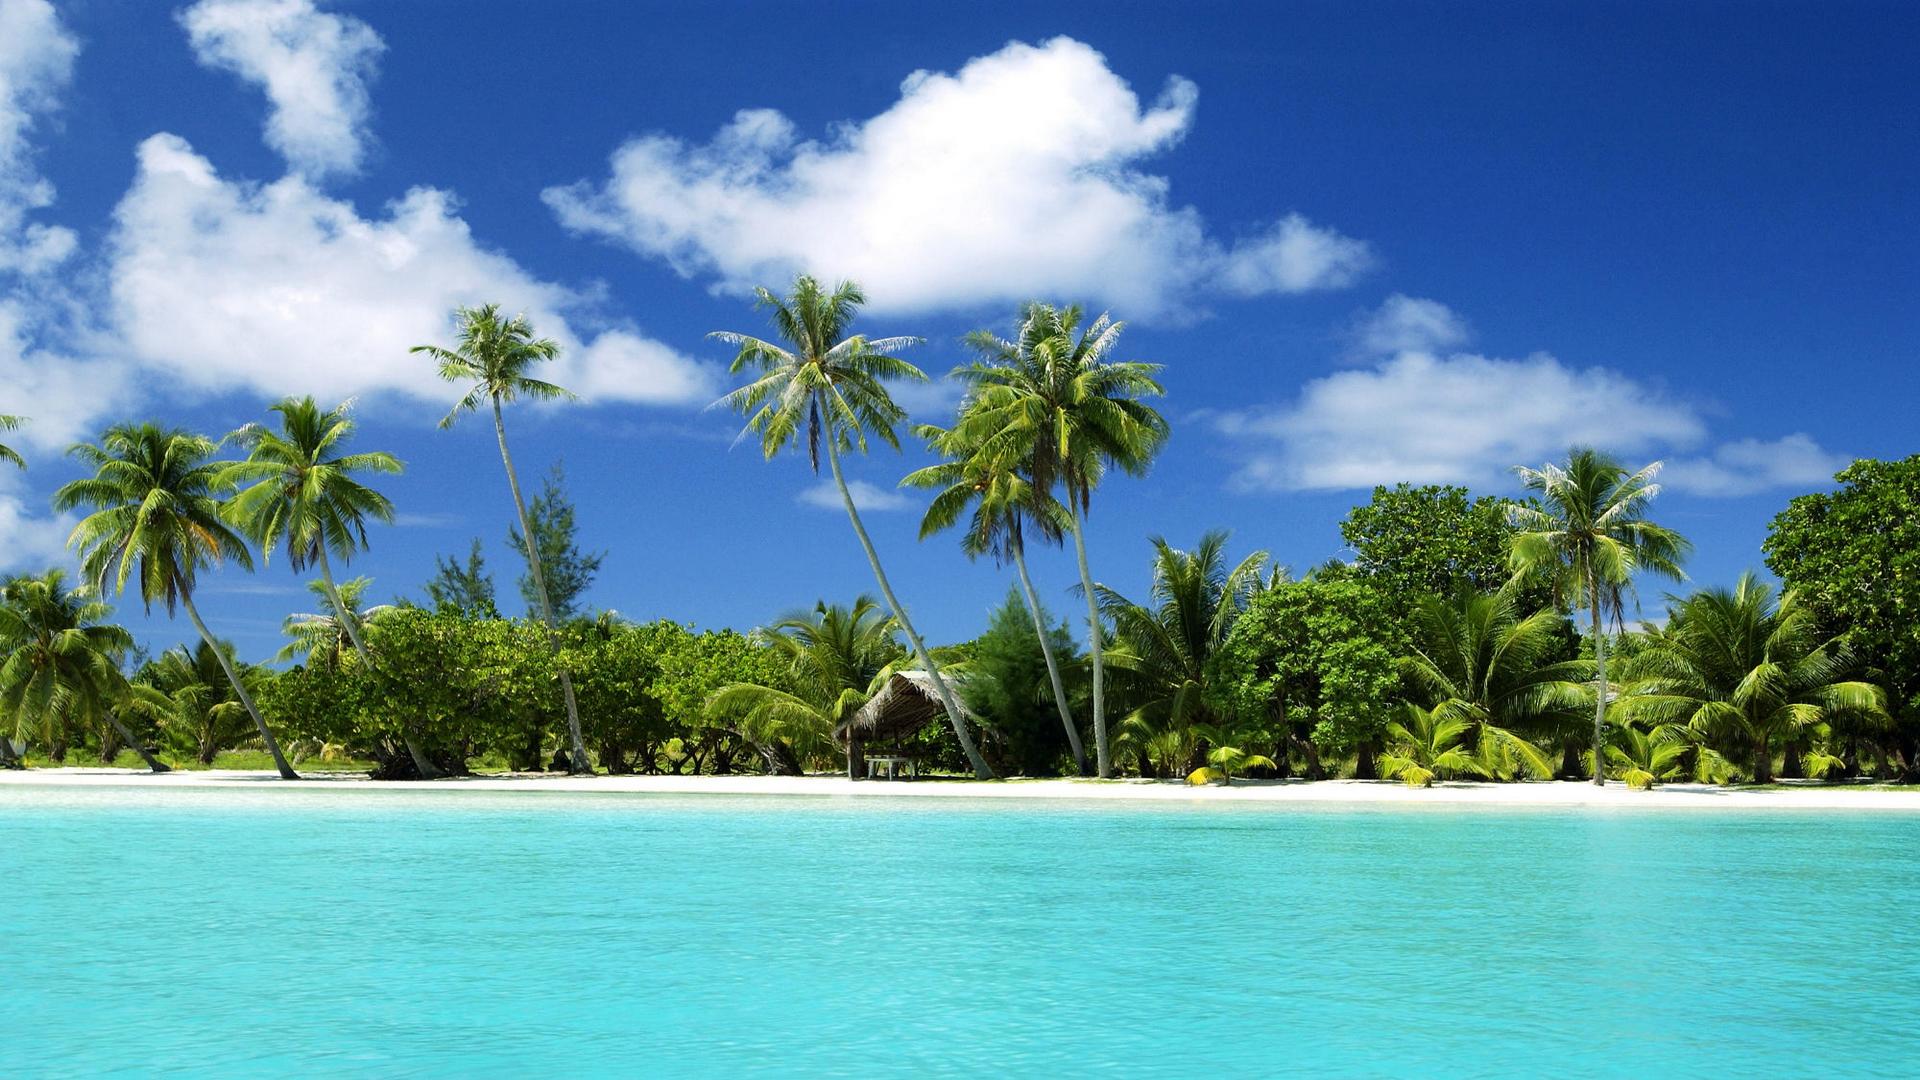 tropical beaches desktop wallpaper Car Pictures 1920x1080